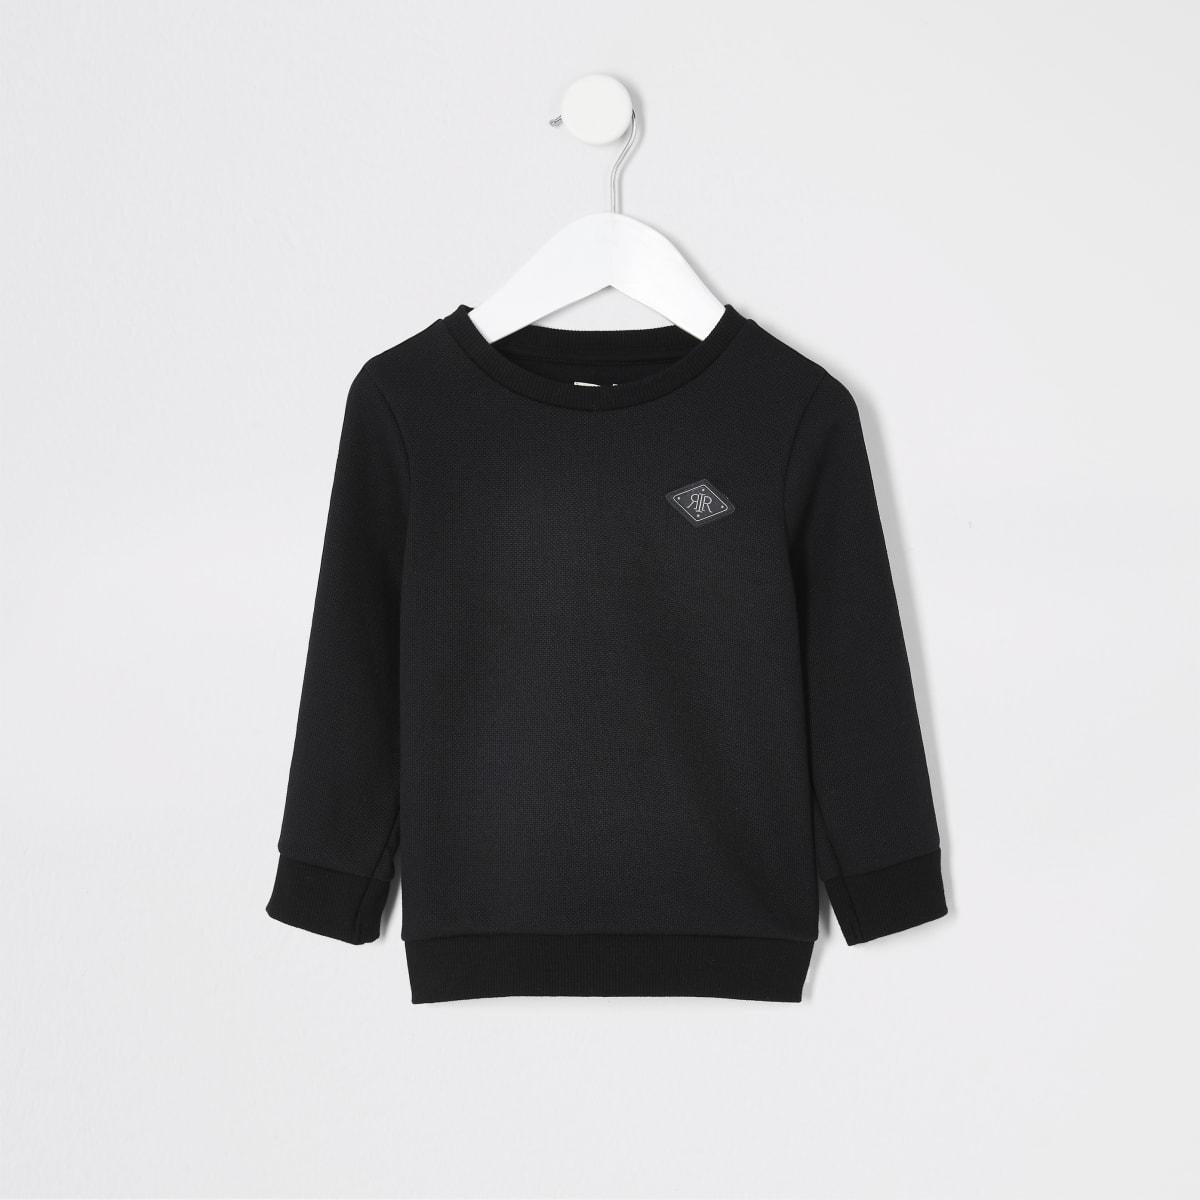 Mini boys black pique tape Maison sweatshirt